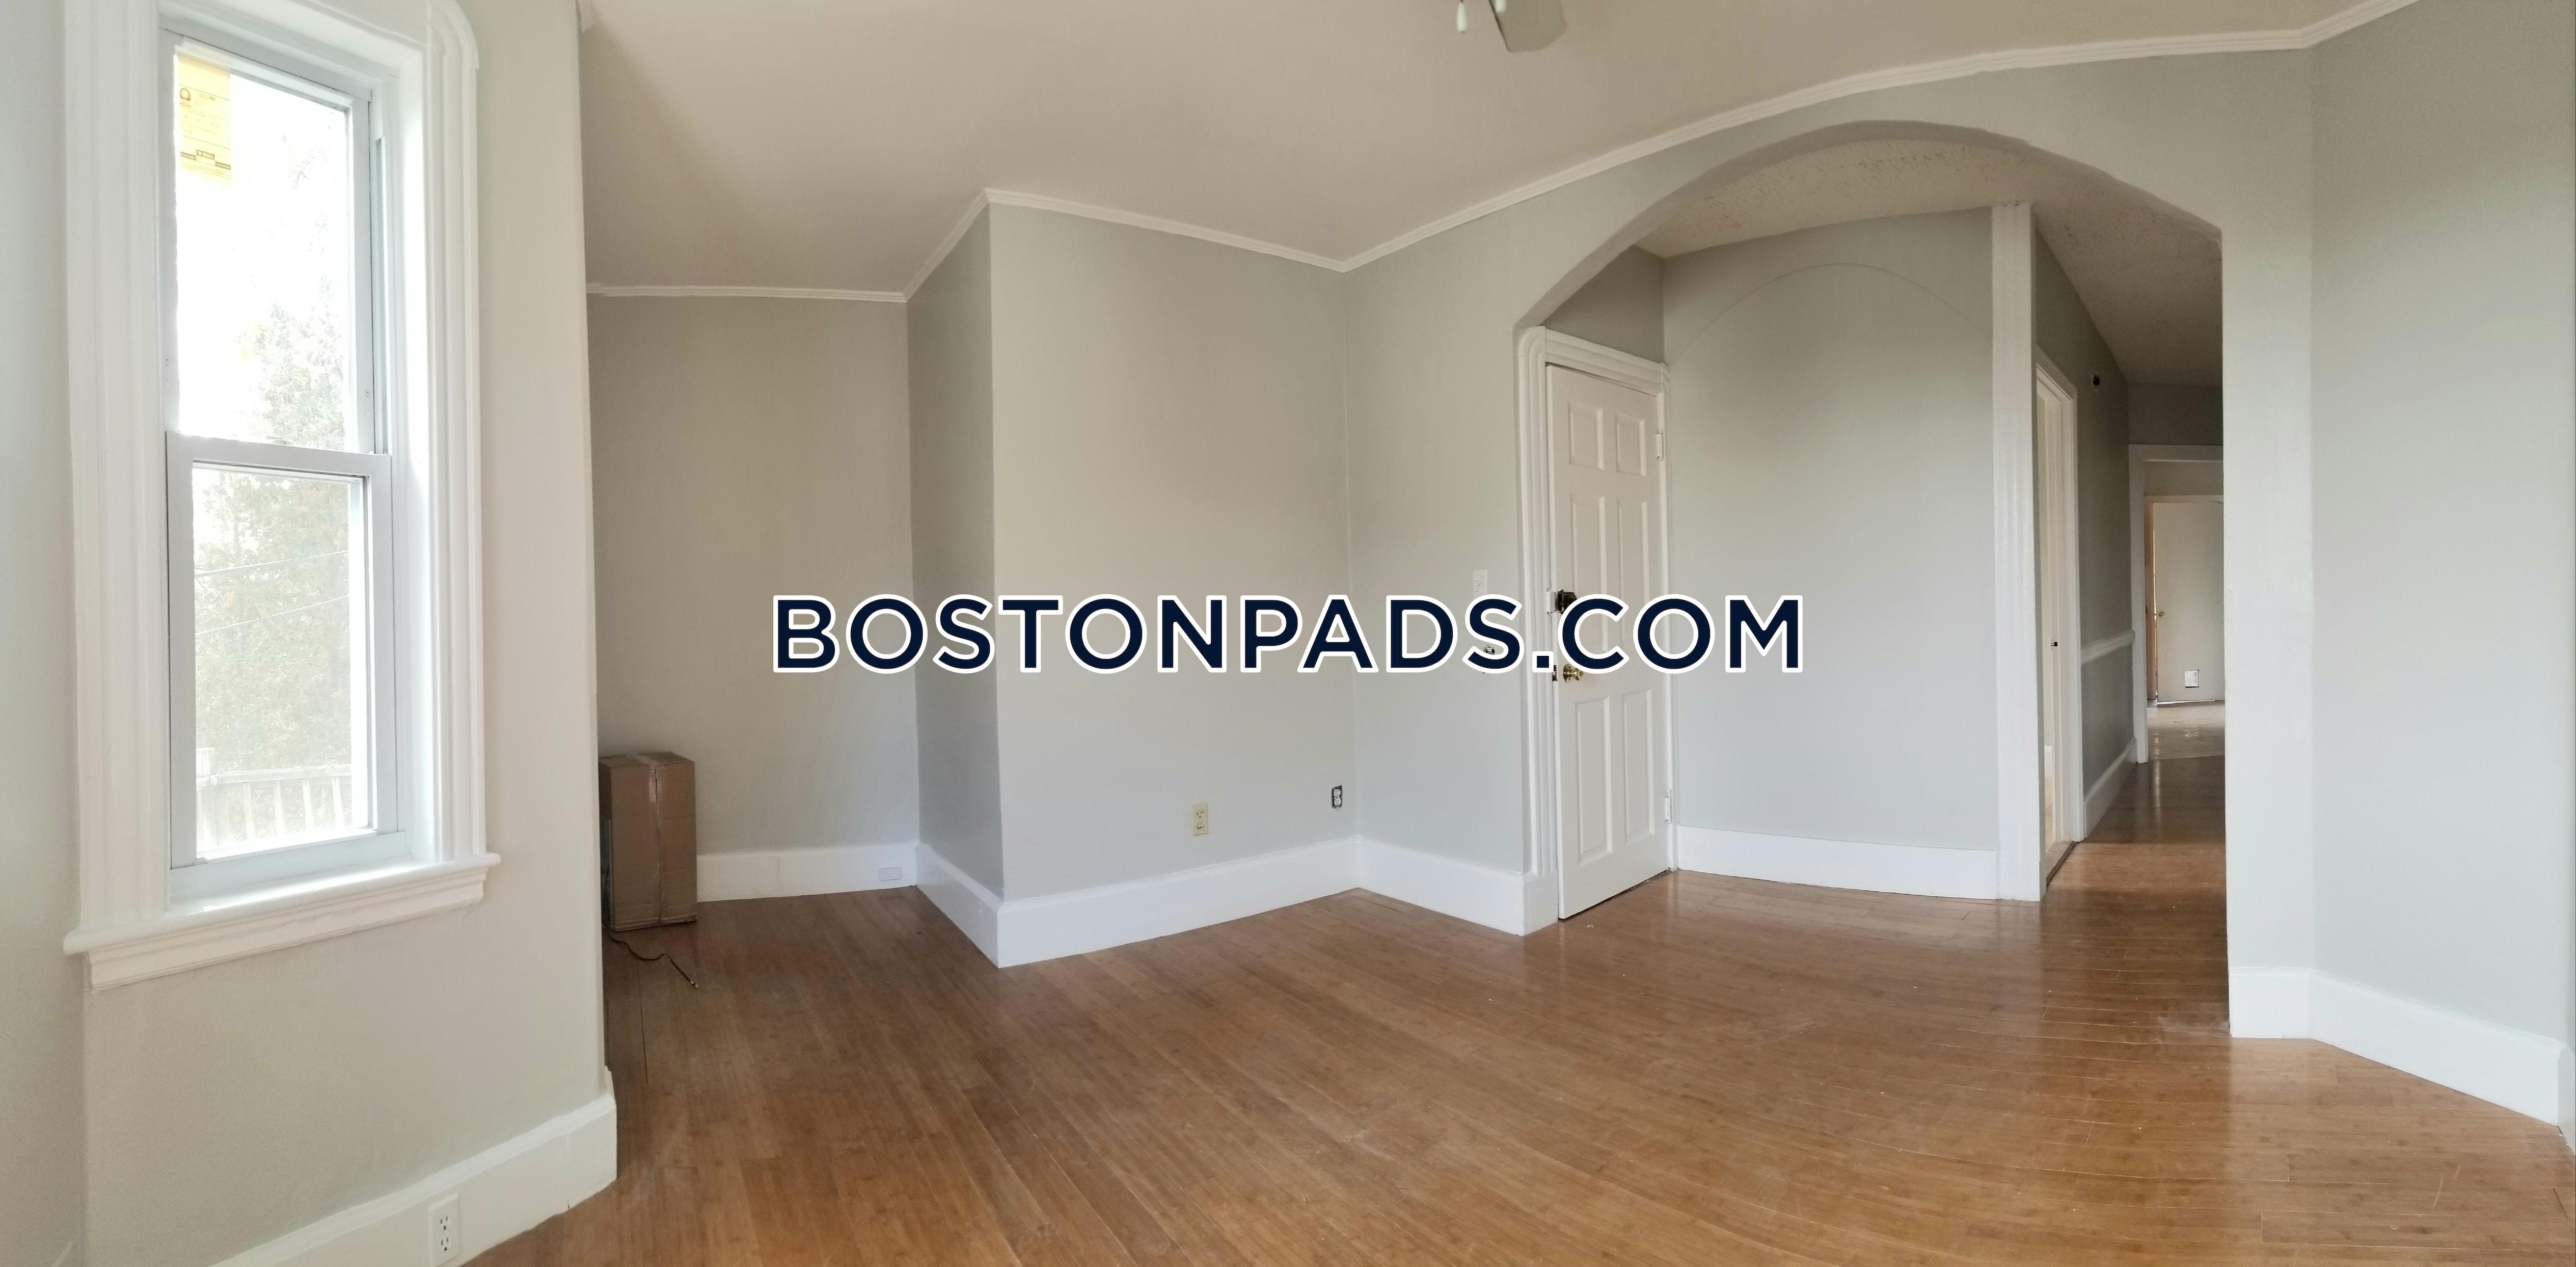 BOSTON - HYDE PARK - $2,250